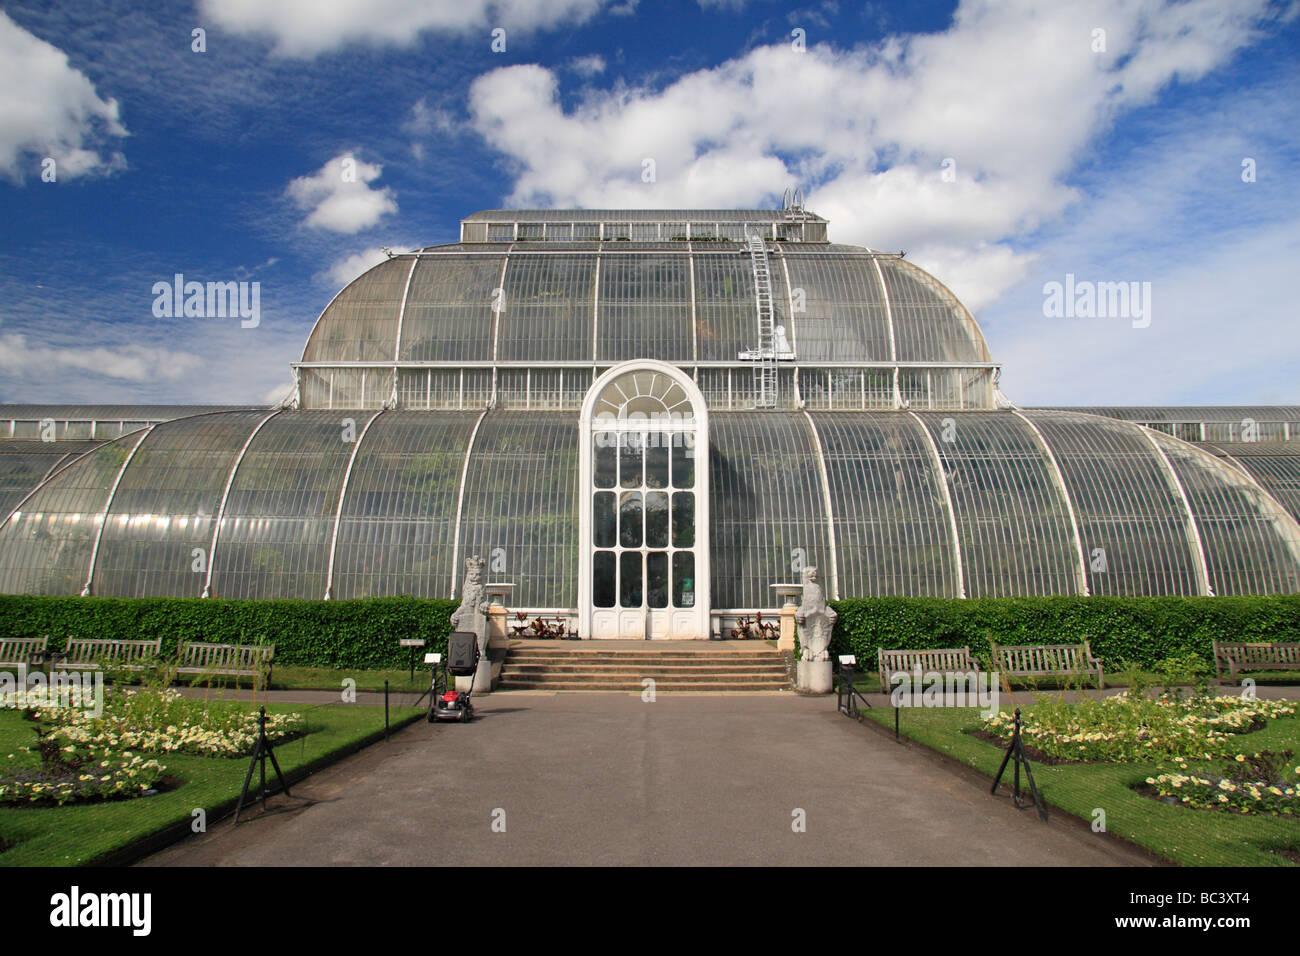 The main entrance to the Palm House, The Royal Botanic Gardens, Kew, Surrey, England. - Stock Image